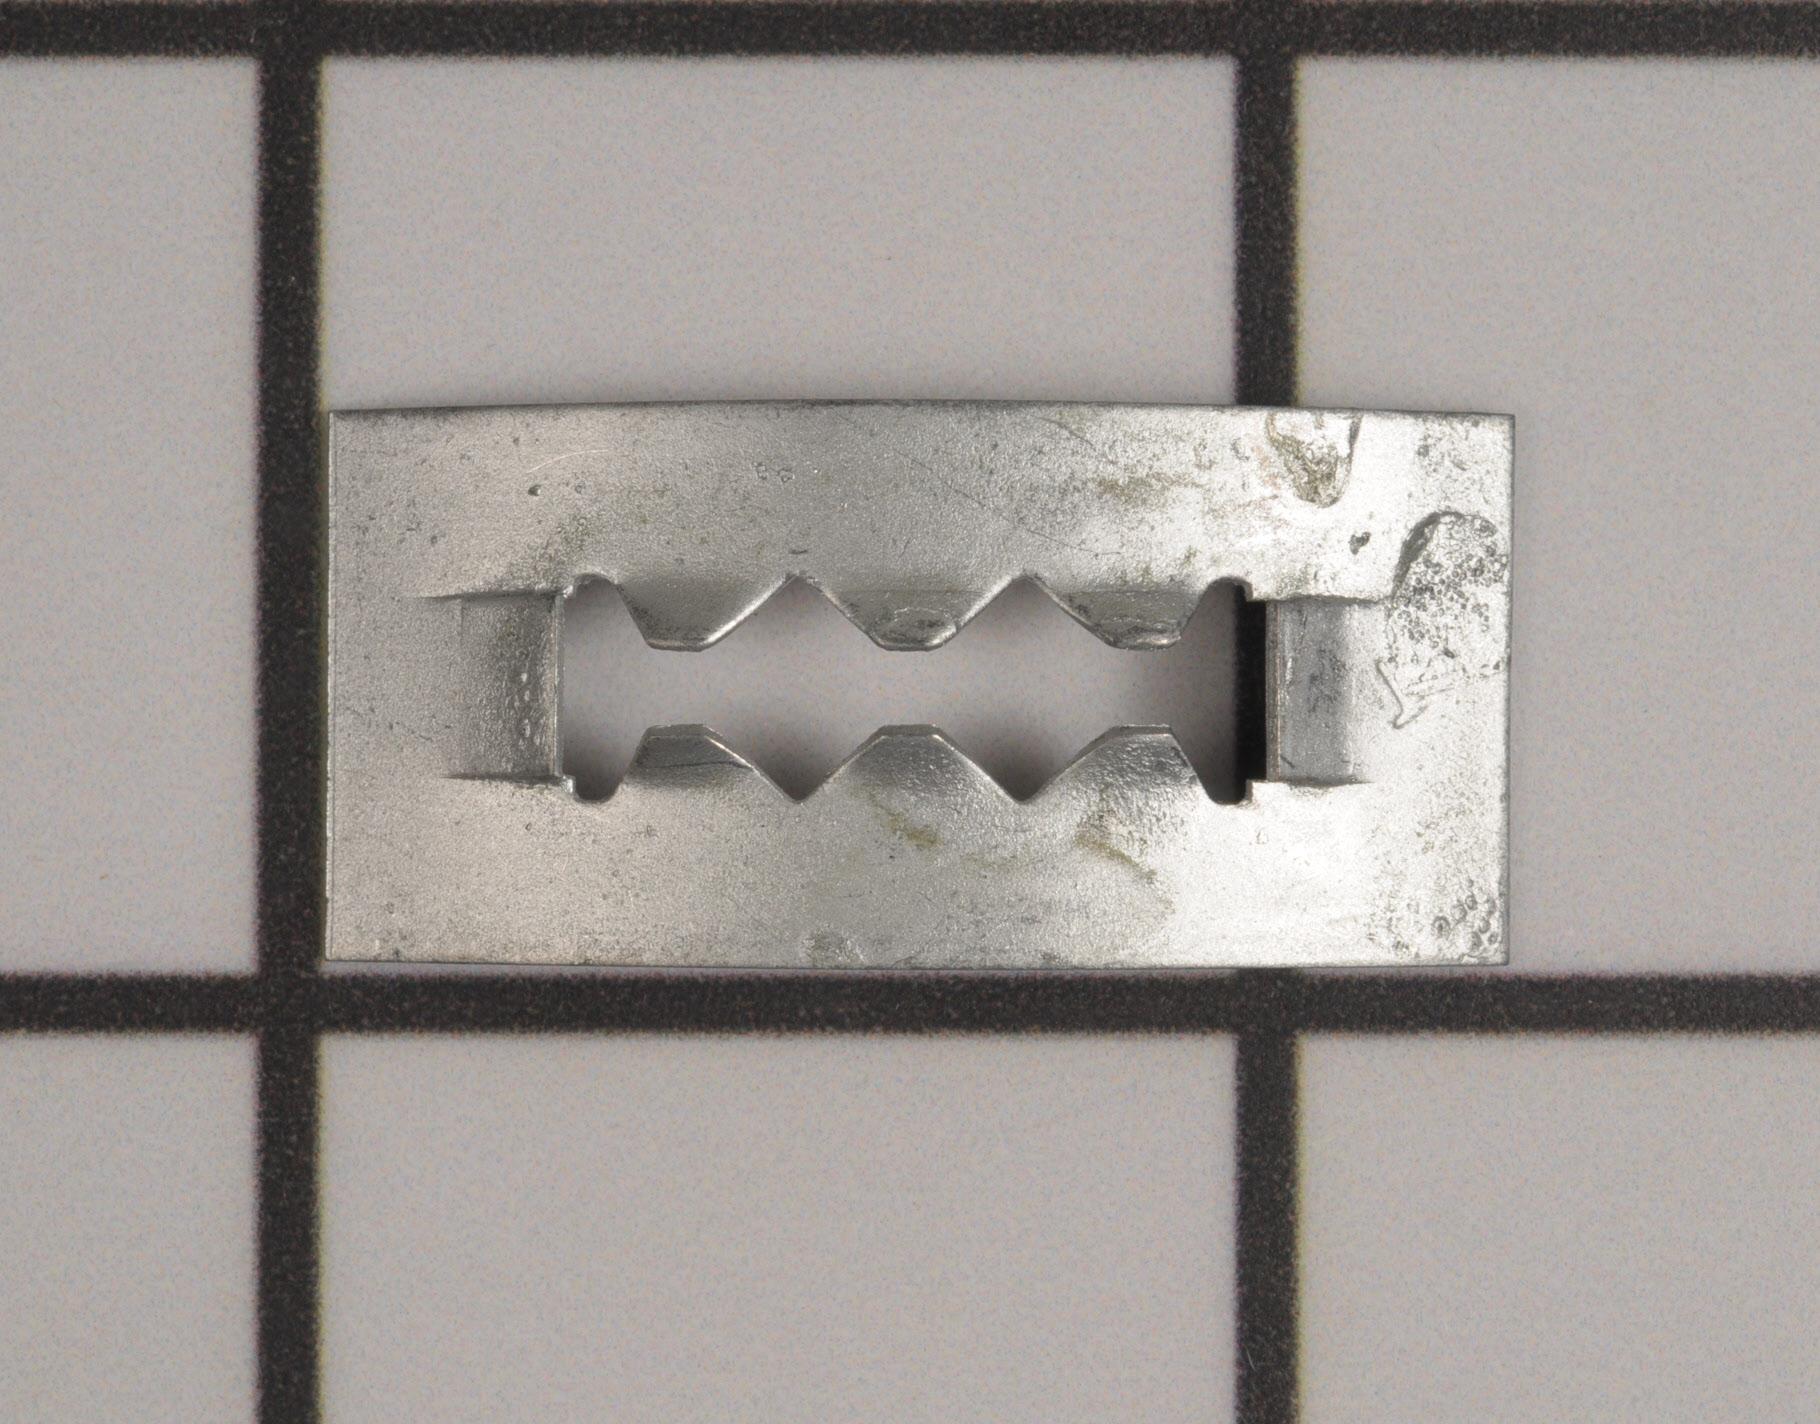 Crosley Freezer Part # 3-24059-024 - Clip